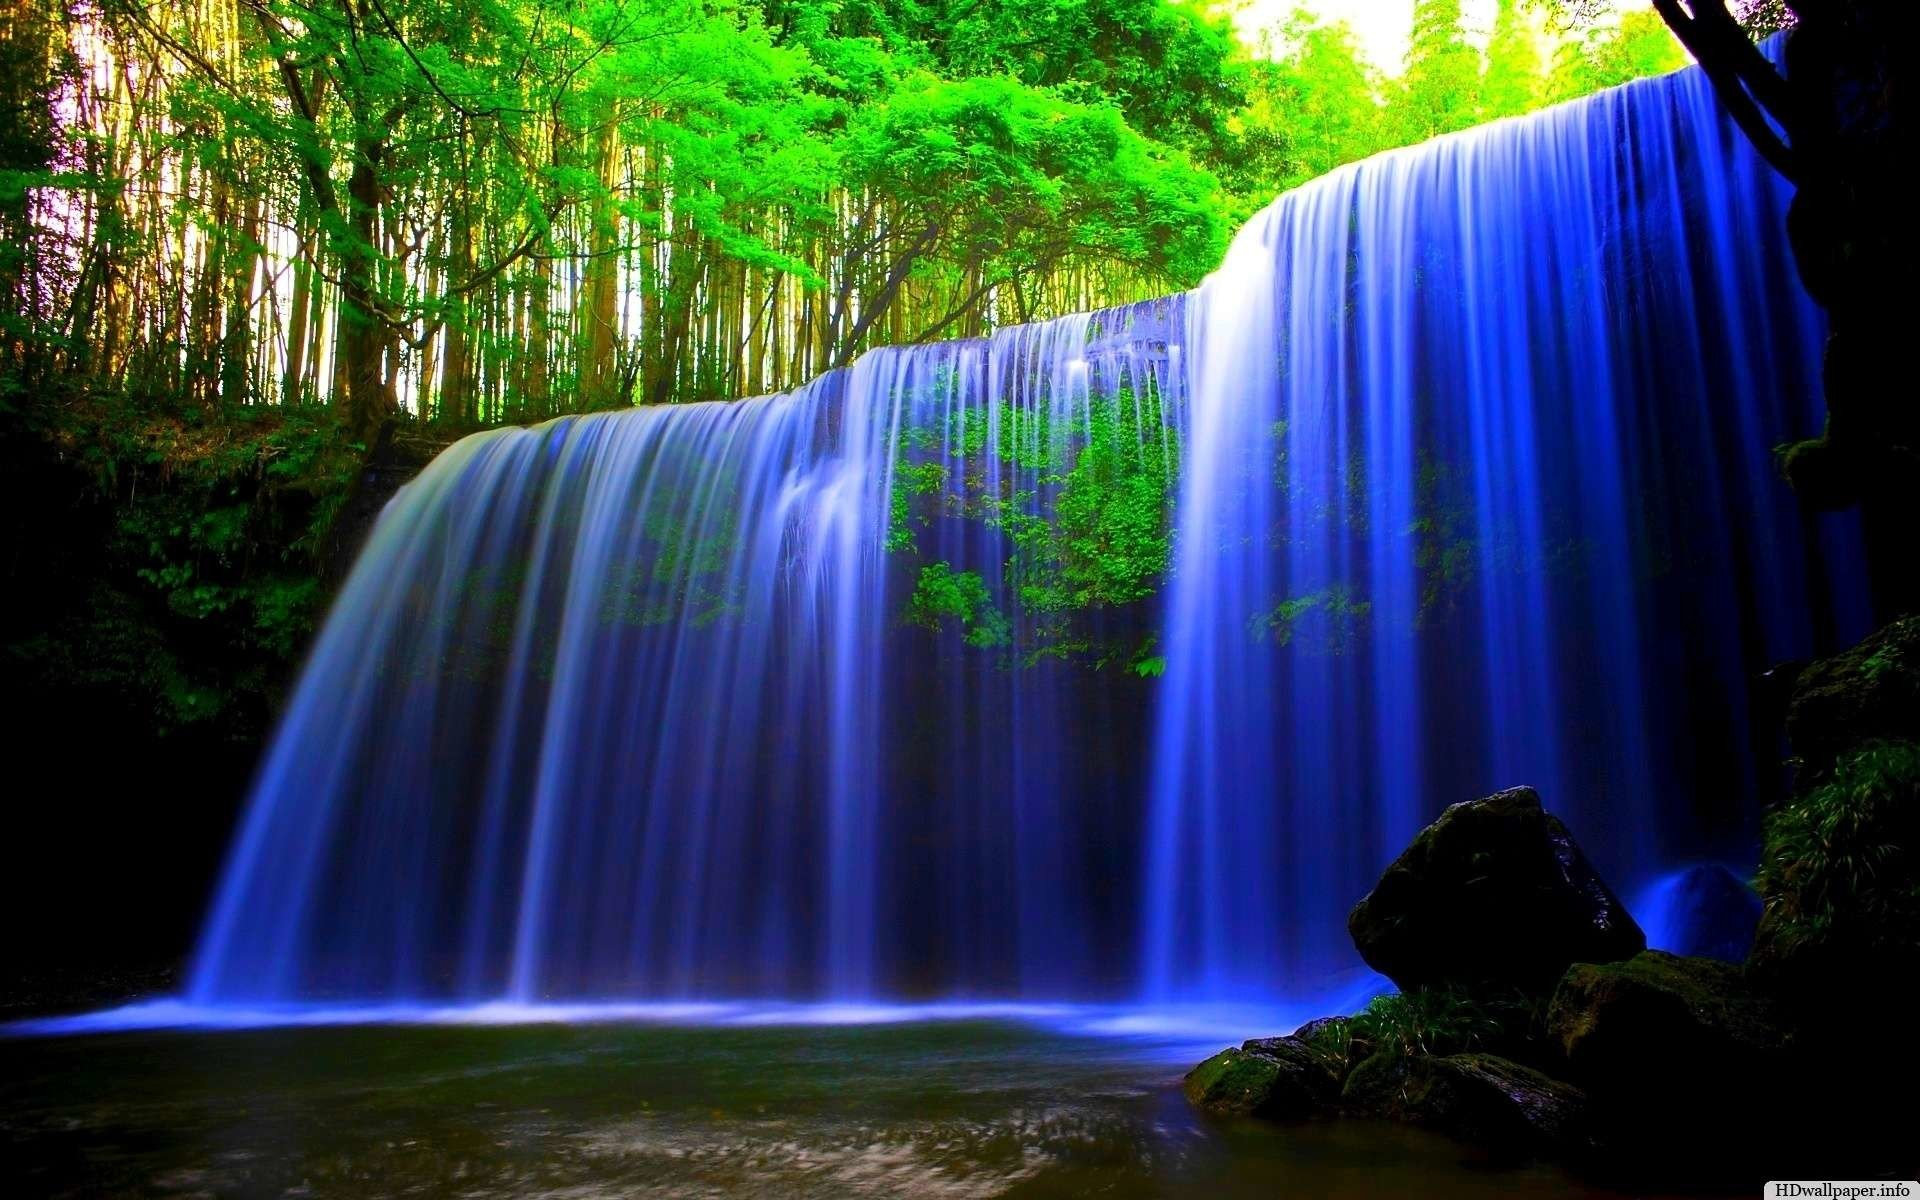 Hd wallpaper waterfall – Hd Waterfall 3d Live Wallpaper